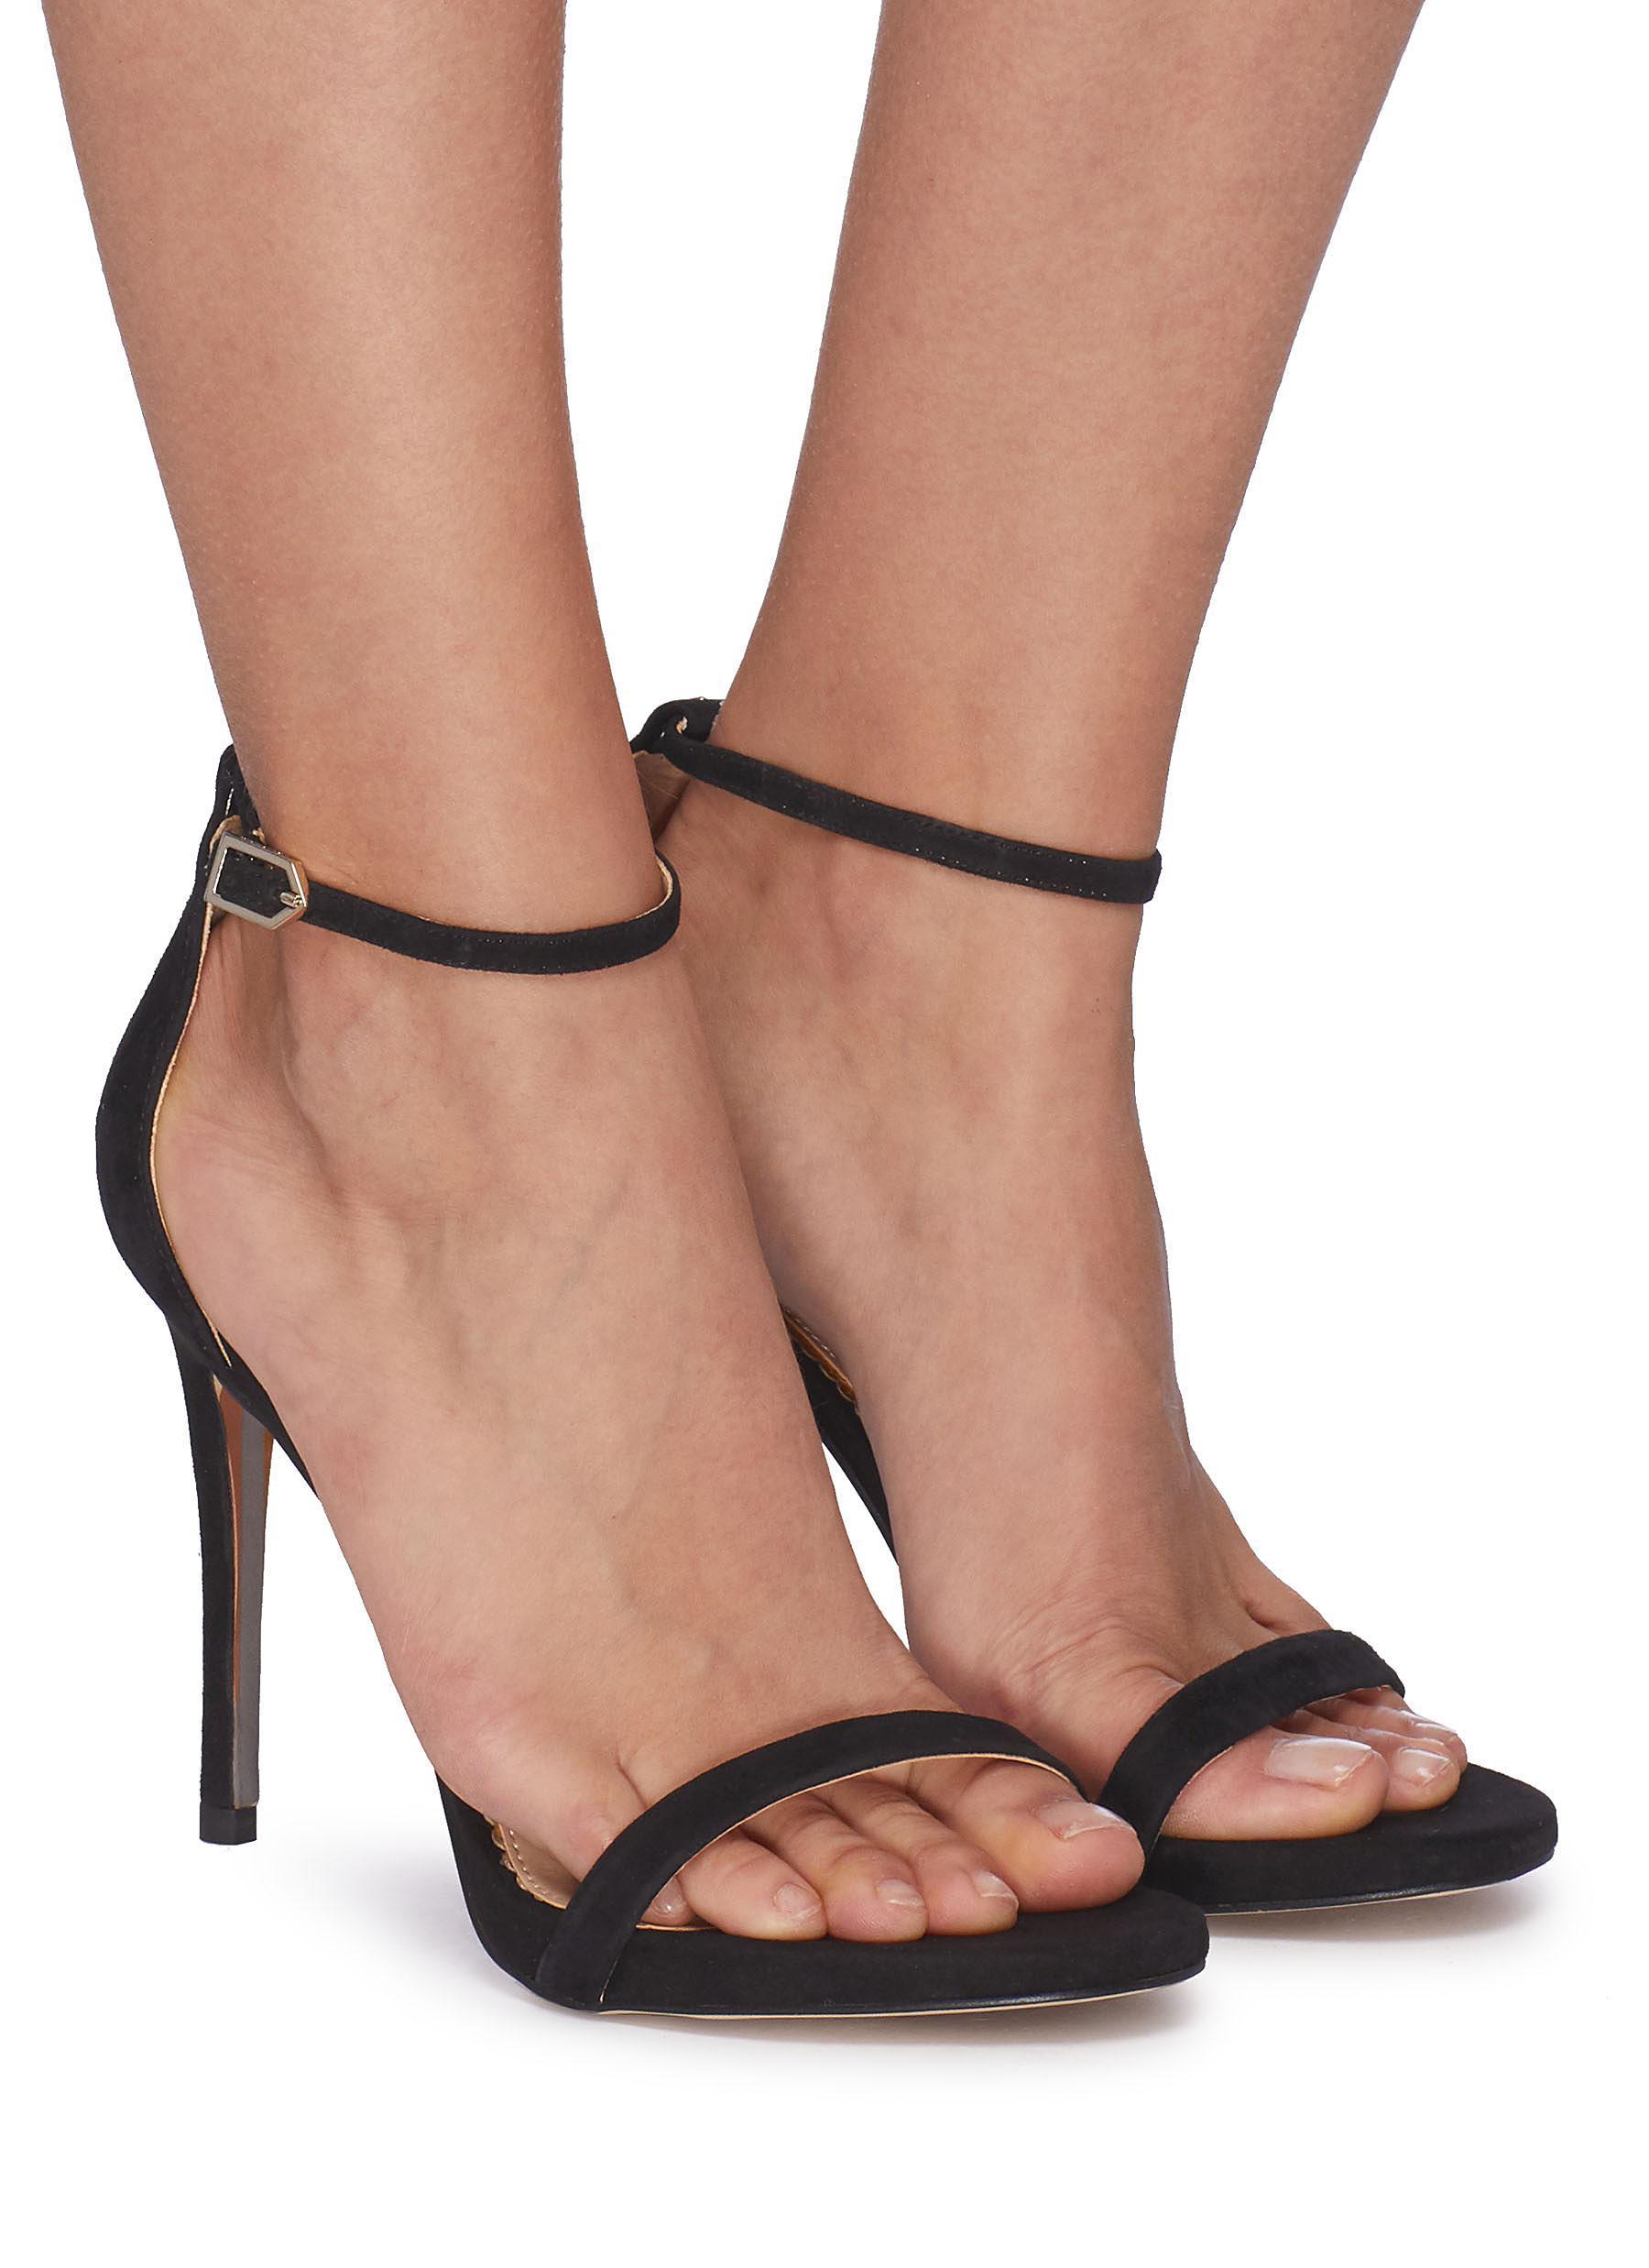 0d840a074a17 Lyst - Sam Edelman  ariella  Ankle Strap Suede Sandals in Black